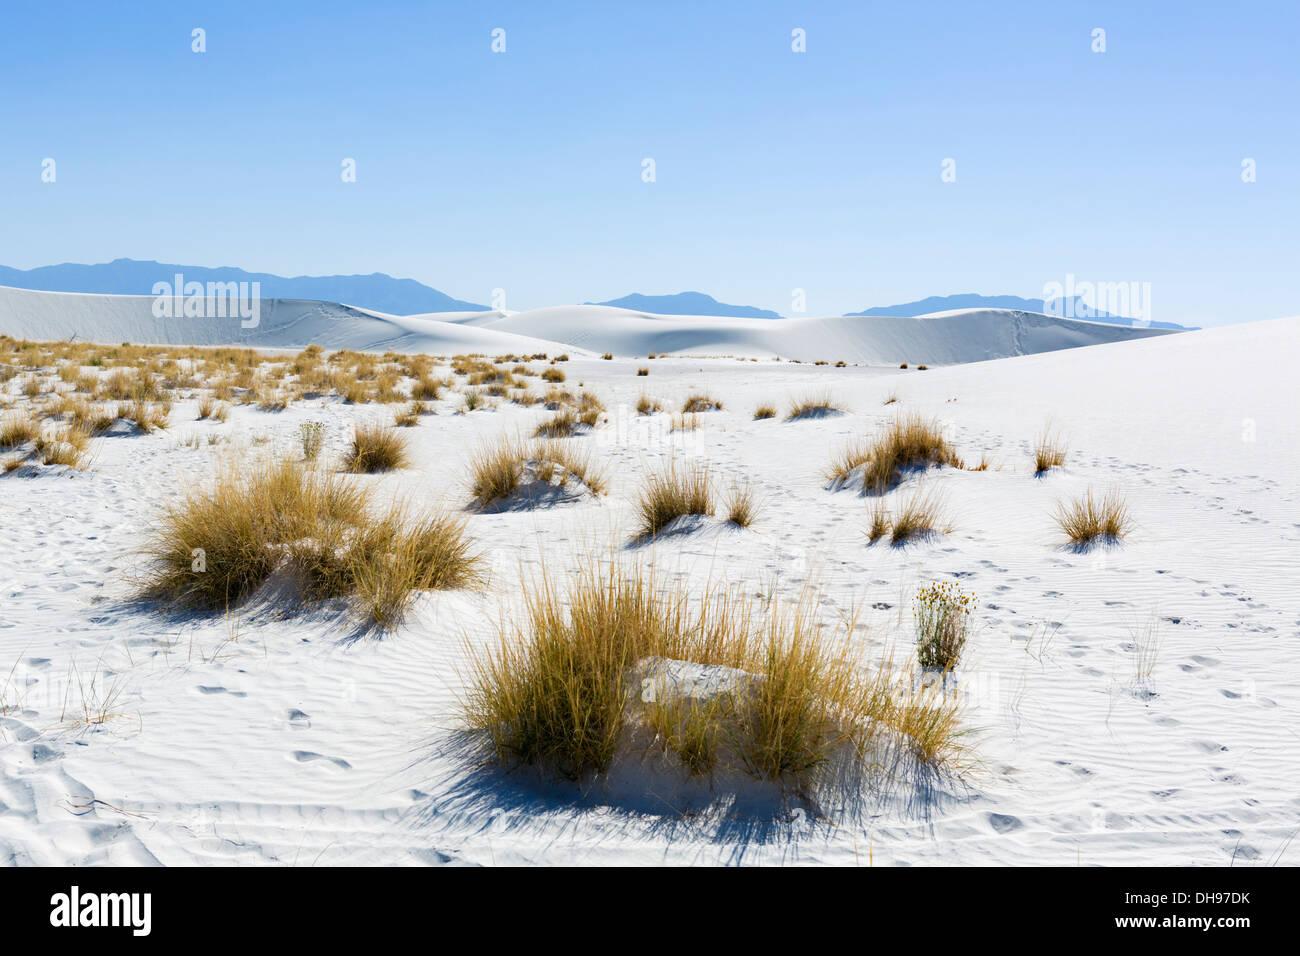 White Sands National Monument, near Alamogordo, New Mexico, USA - Stock Image